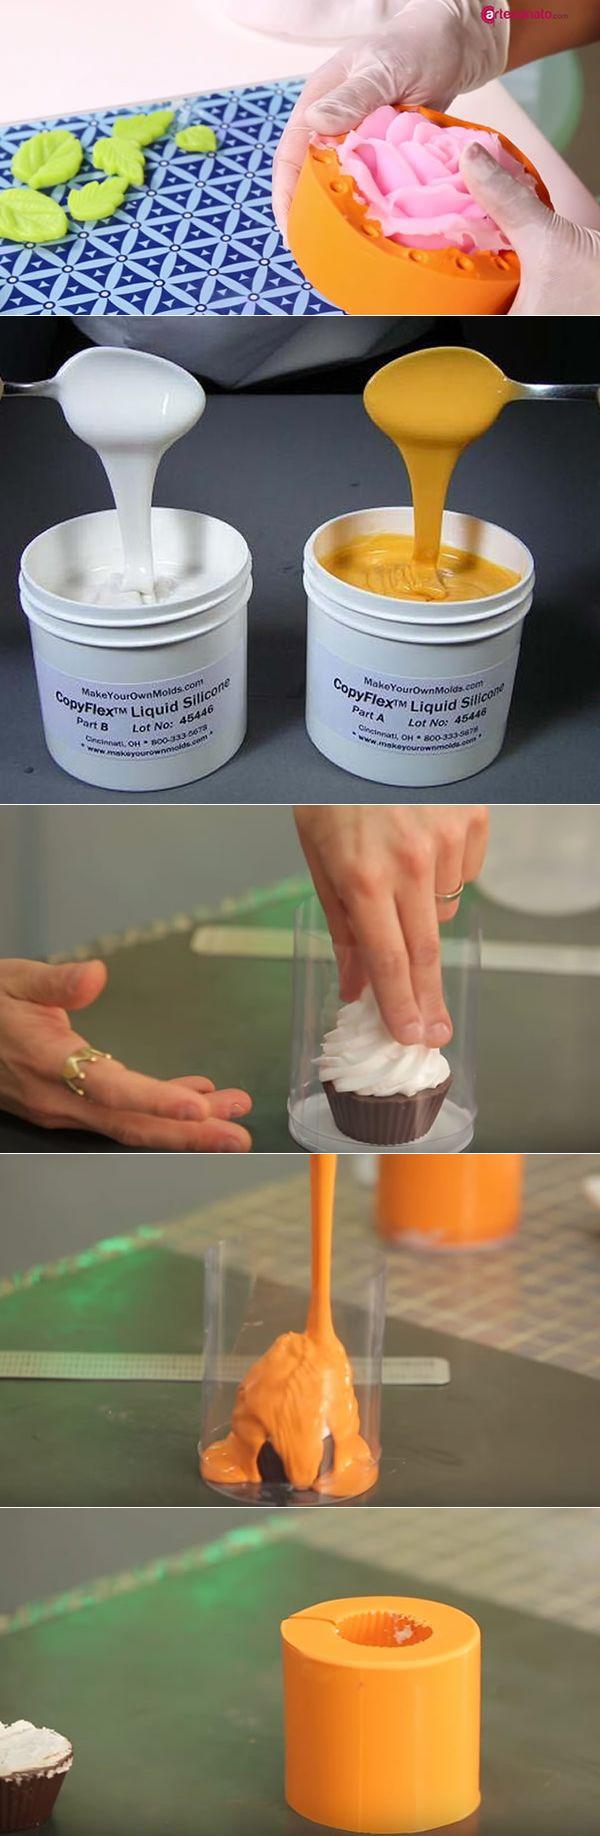 Como Fazer Molde de Silicone para Sabonetes